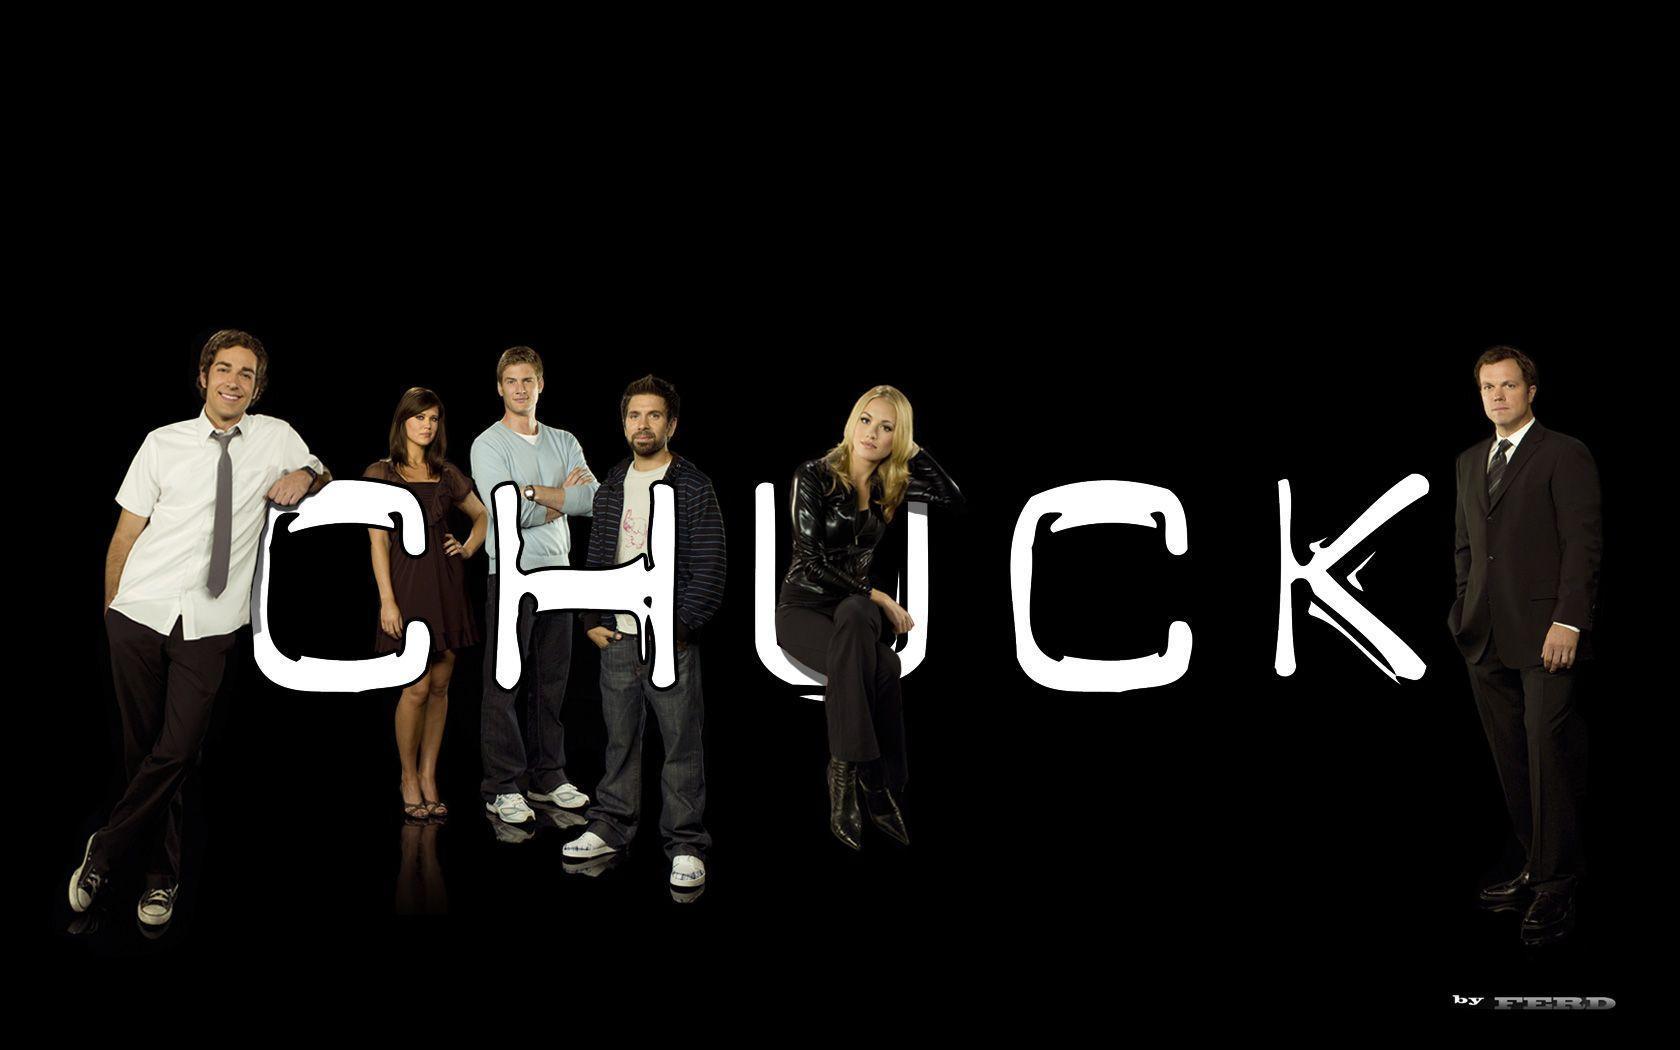 chuck wallpaper - photo #3